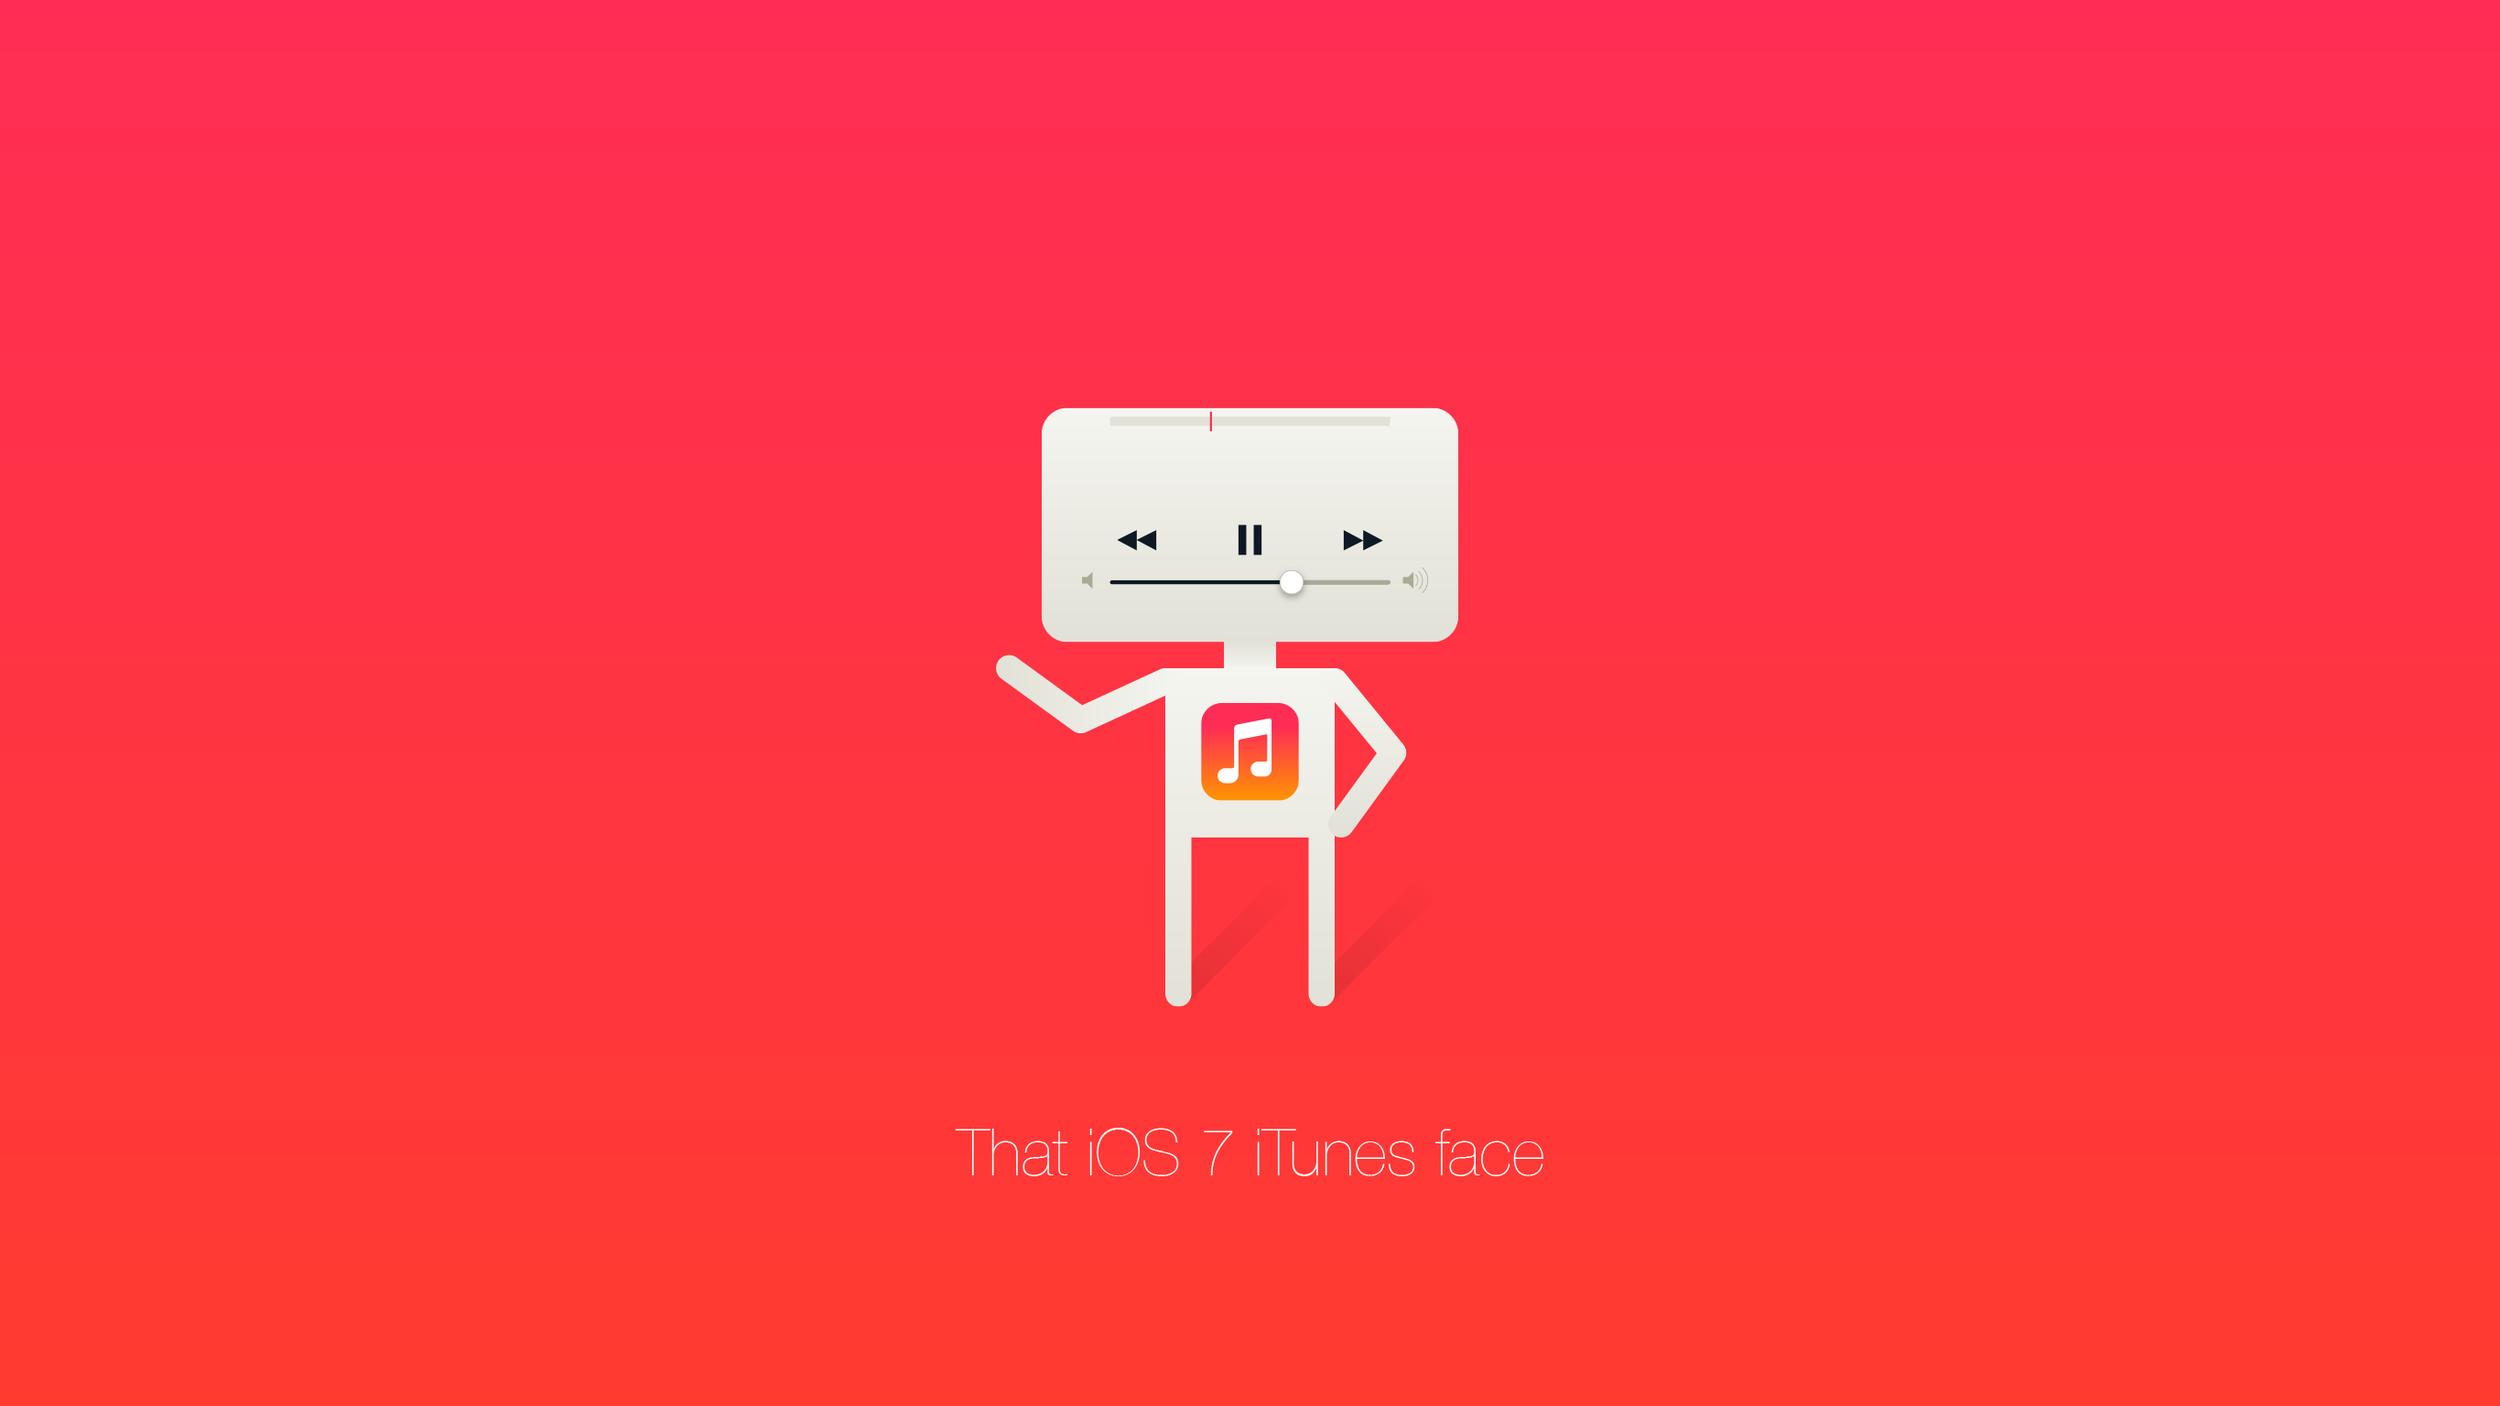 That iOS7 iTunes face